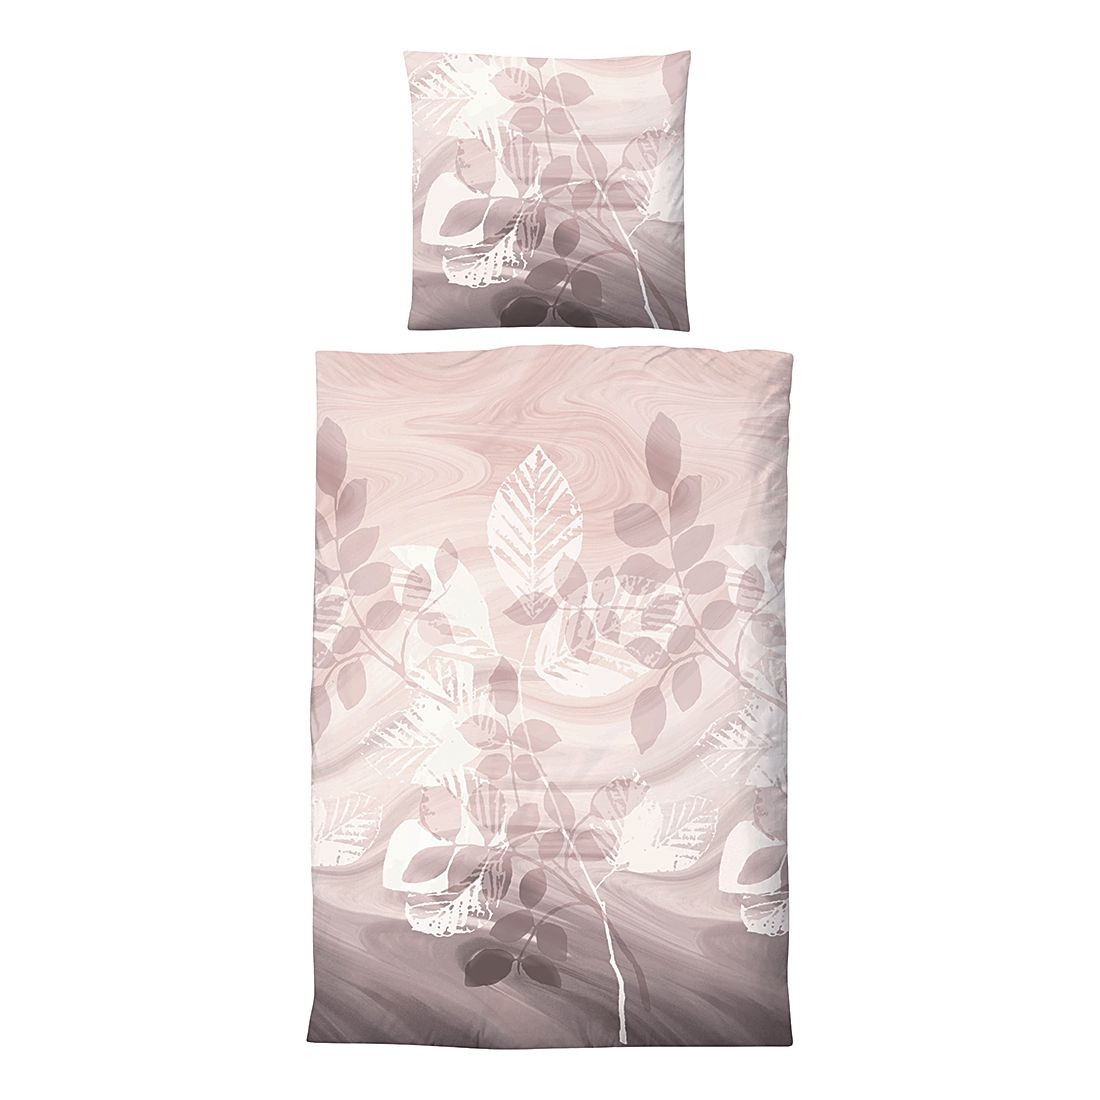 edelflanell bettw sche corinna beige 135 x 200 cm kissen 80 x 80 cm biberna online bestellen. Black Bedroom Furniture Sets. Home Design Ideas